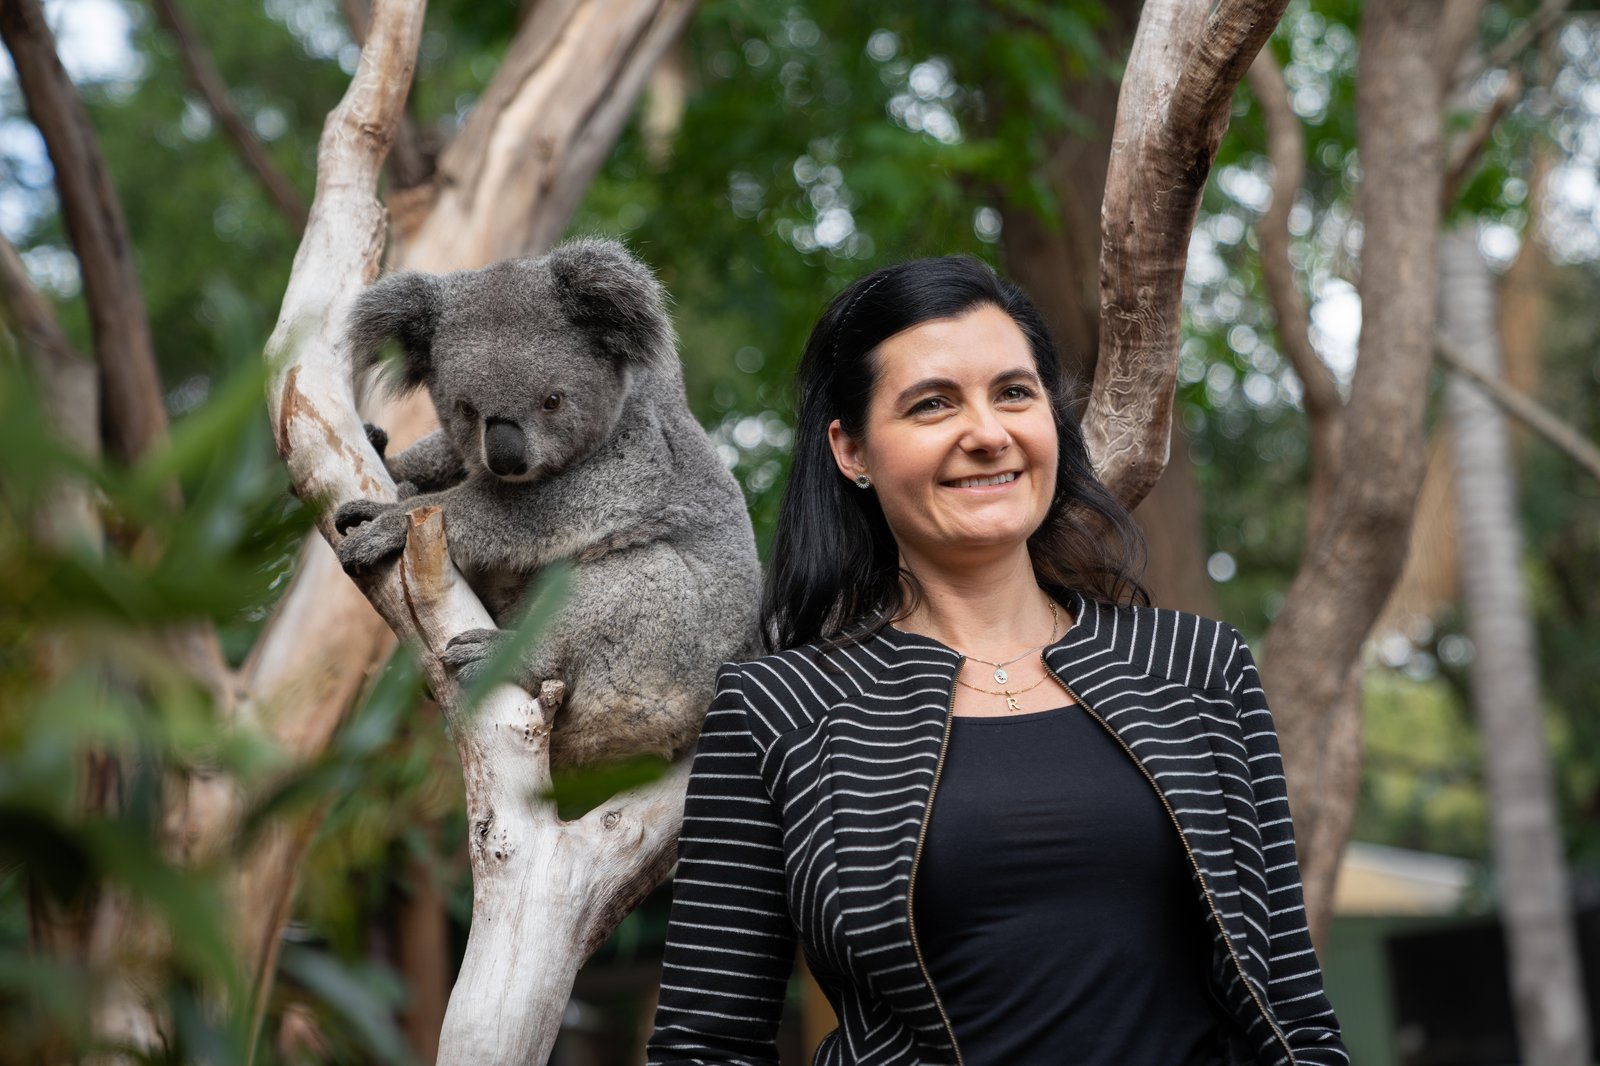 Rebecca Johnson and Koala at Featherdale Wildlife Park